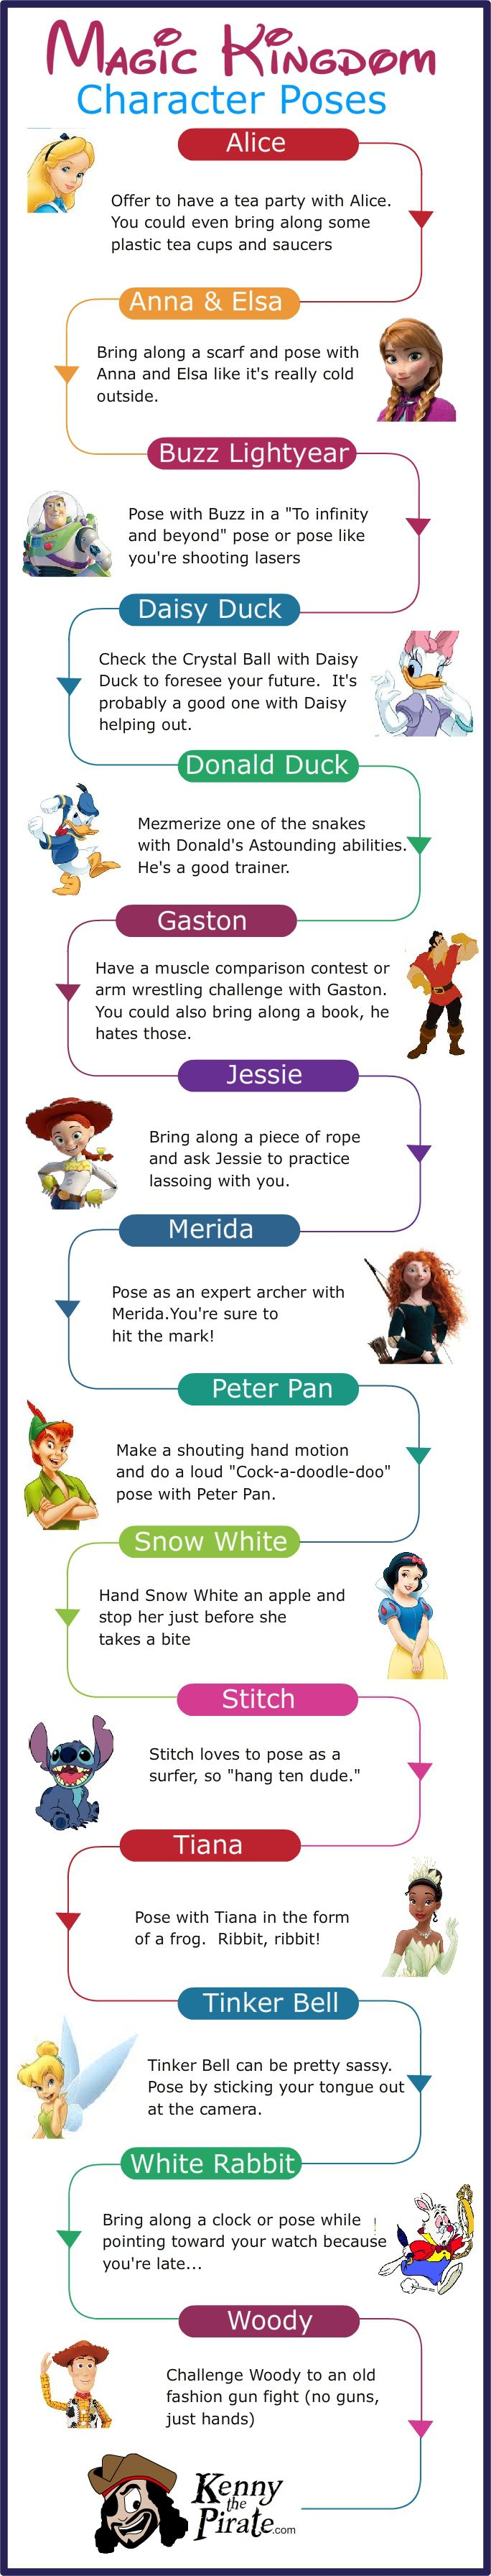 KennythePirate Poses for Magic Kingdom Disney World Character Photos #KtP